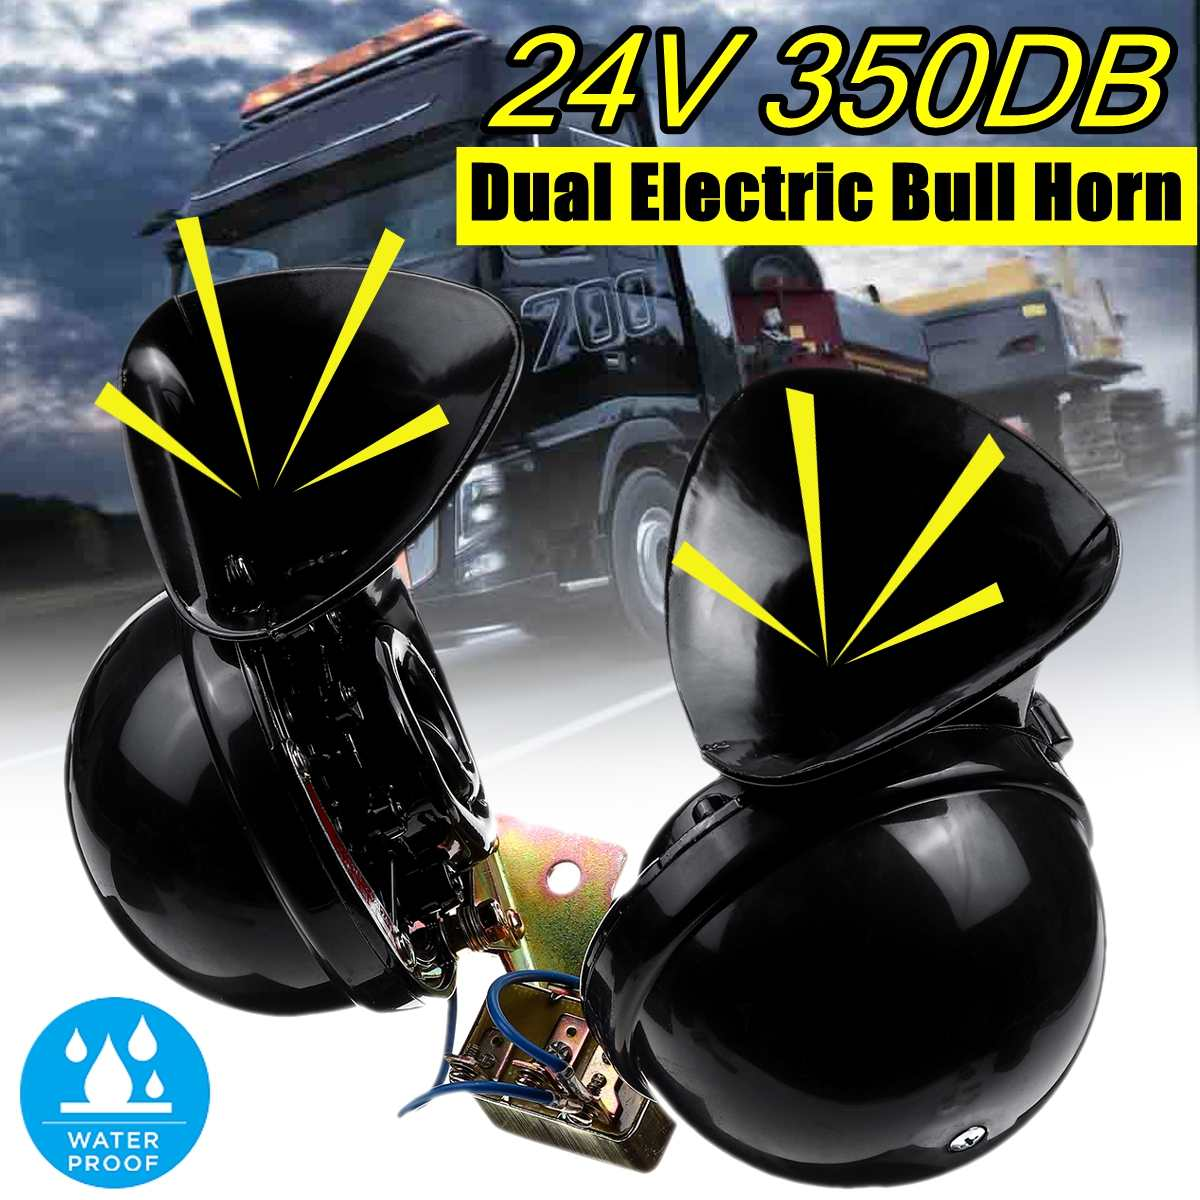 Universal 12V 24V DC impermeable Caracol aire motocicleta cuerno extremo fuerte 350dB para camión moto barco coches accesorios 2 uds